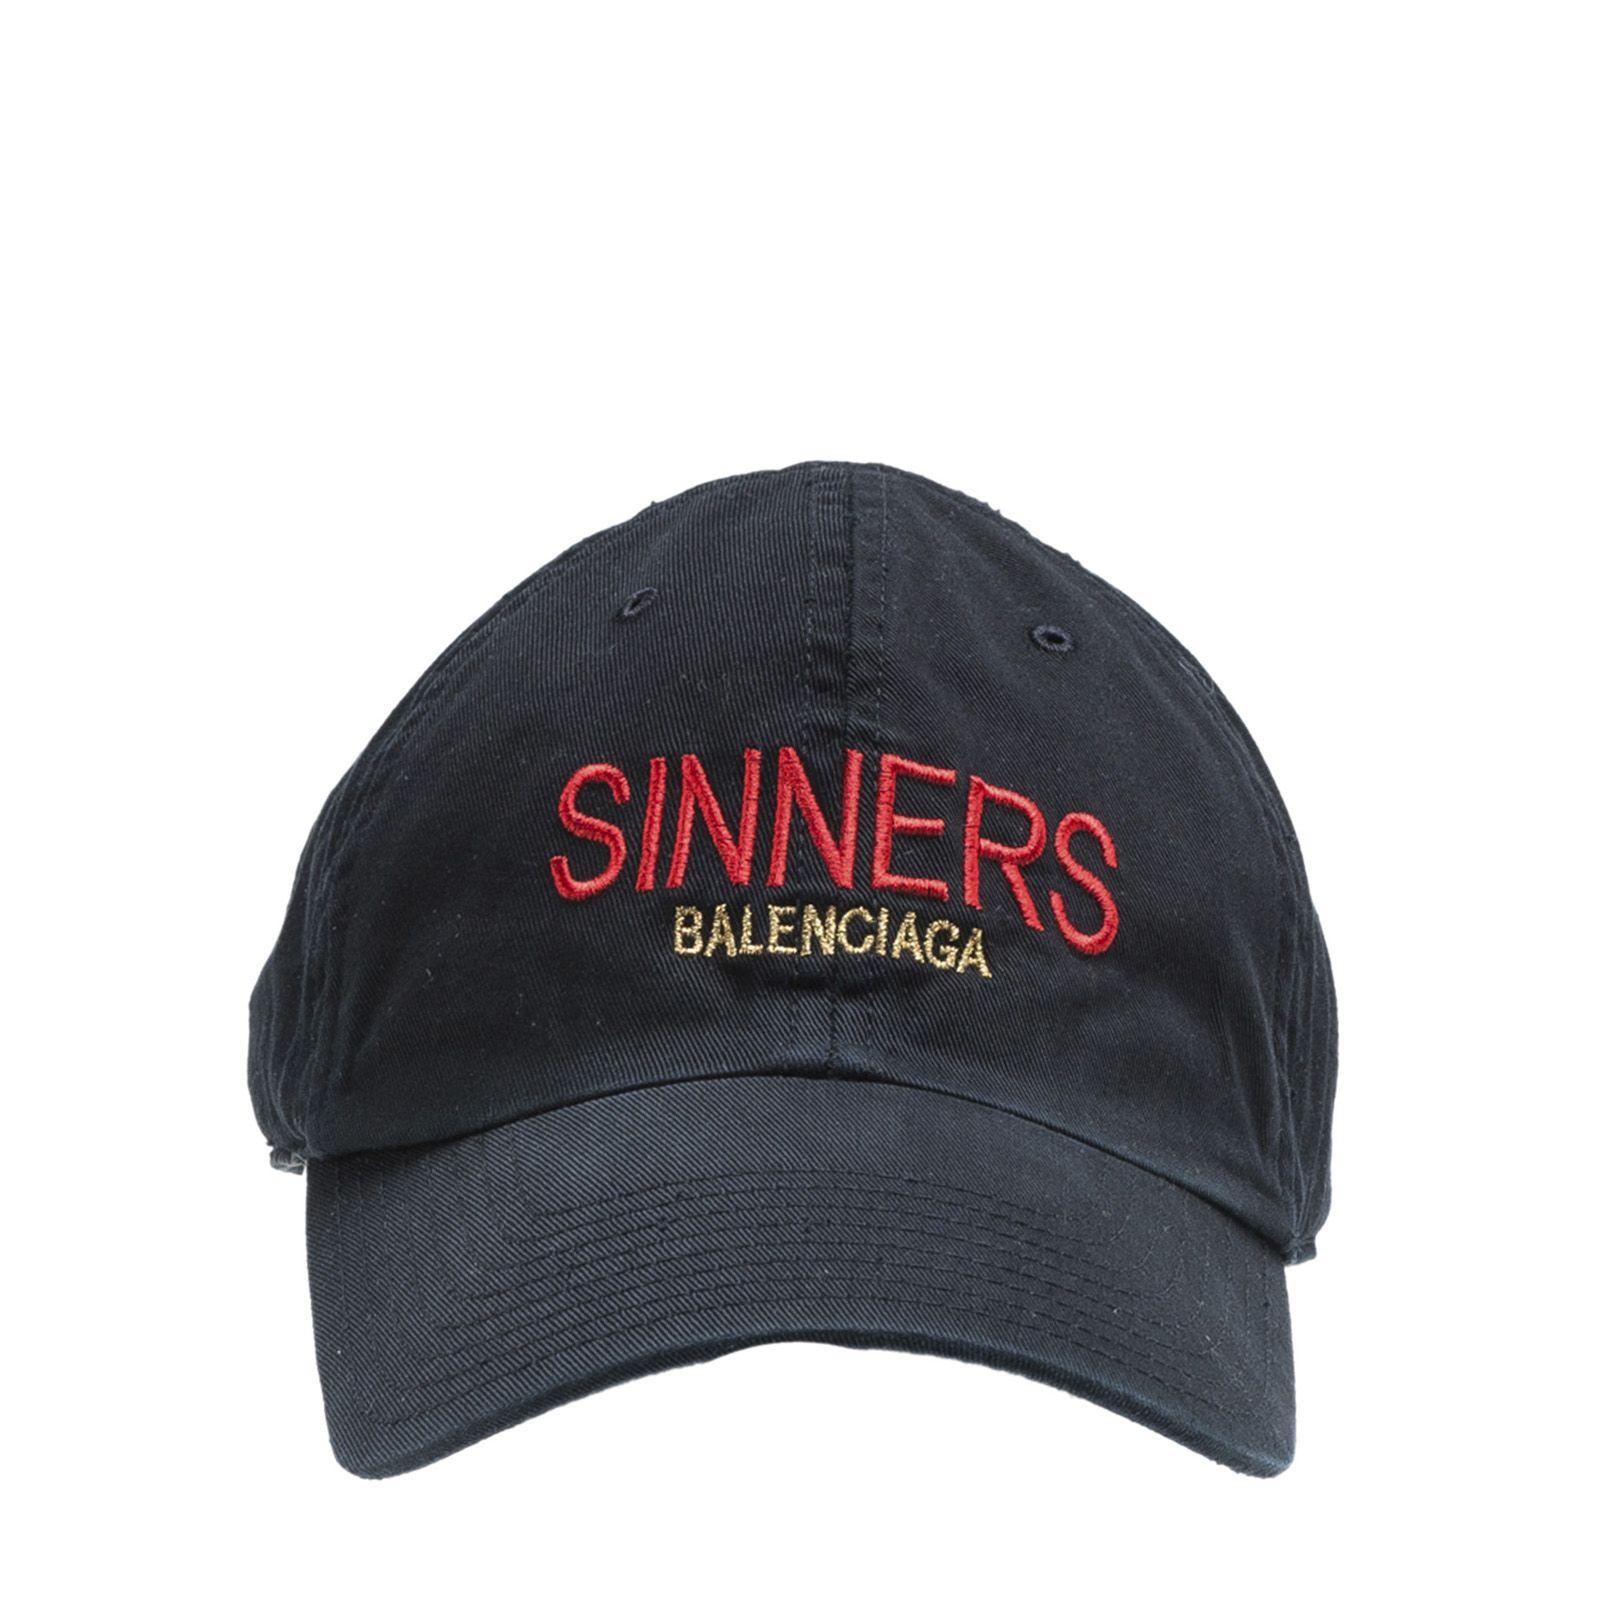 Sinners baseball cap - Black Balenciaga L8aRGW